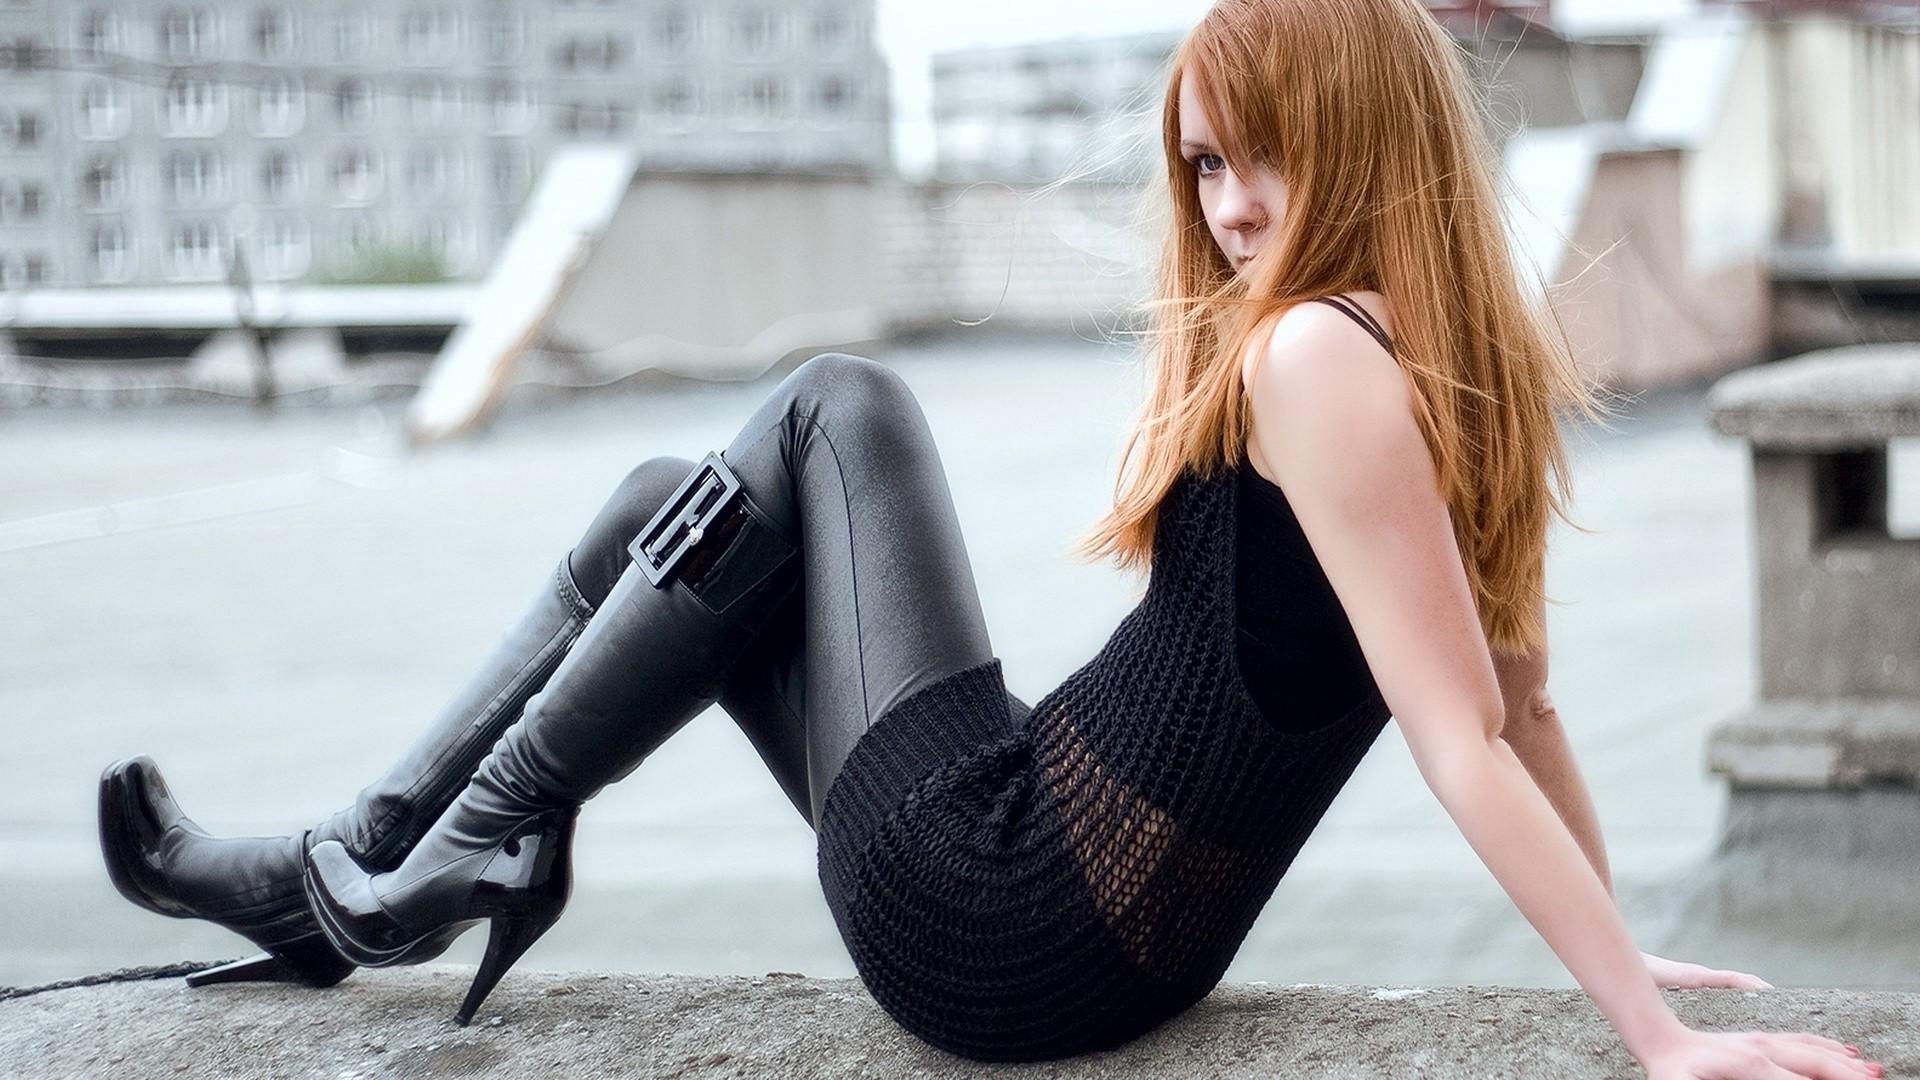 Redhead Boots 57